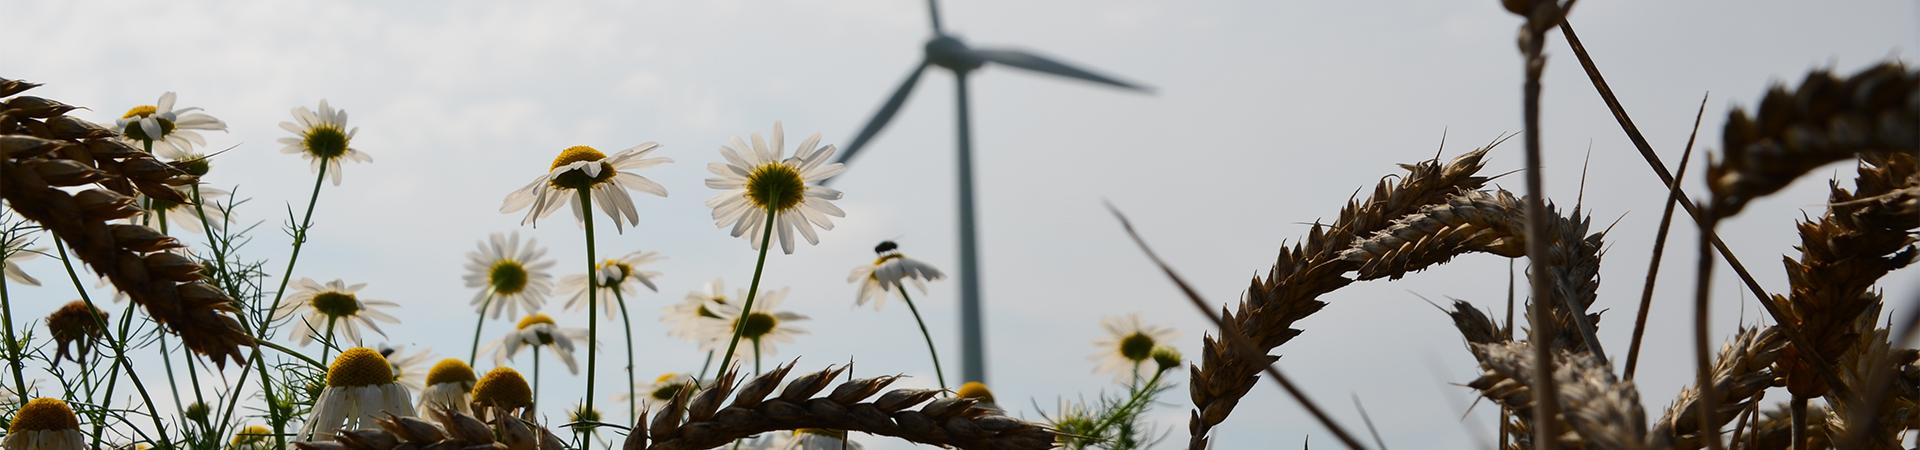 SL Windenergie Blumen Kornfeld